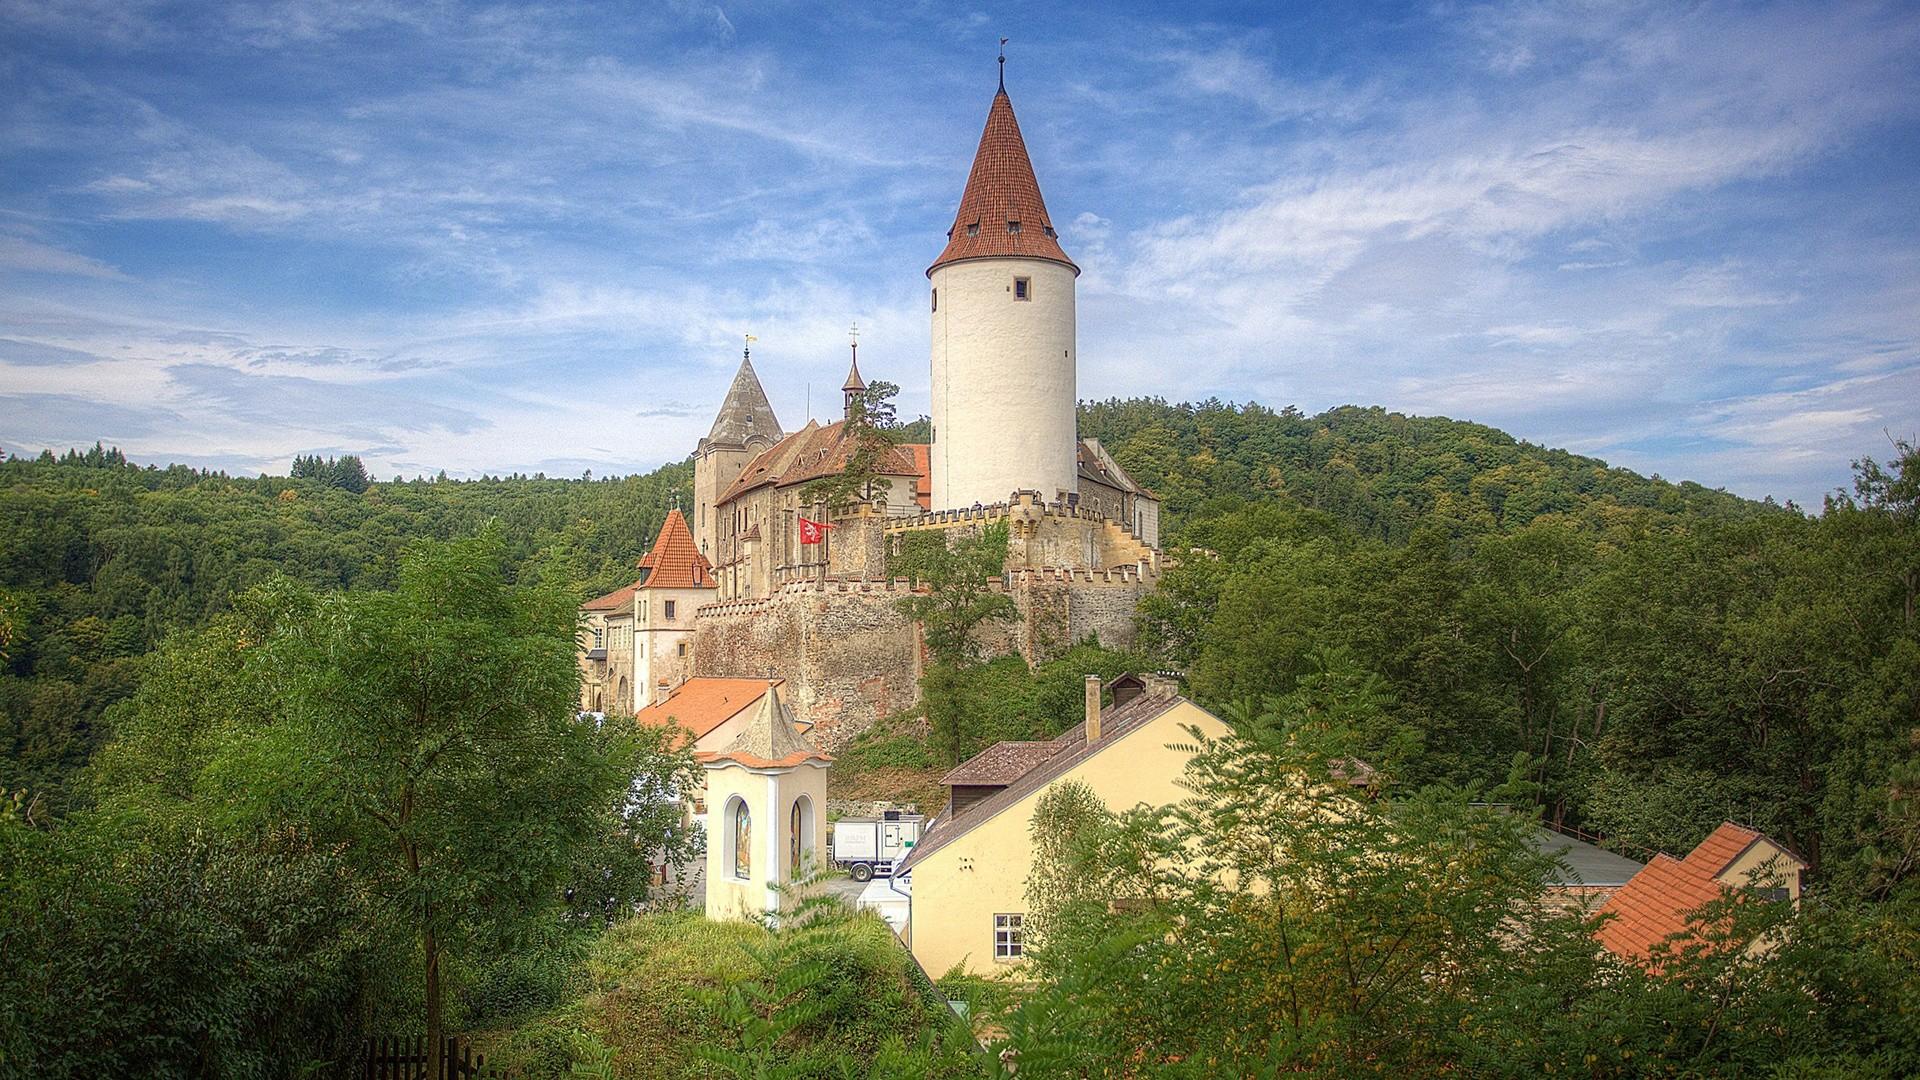 Křivoklát, um castelo medieval na República Checa